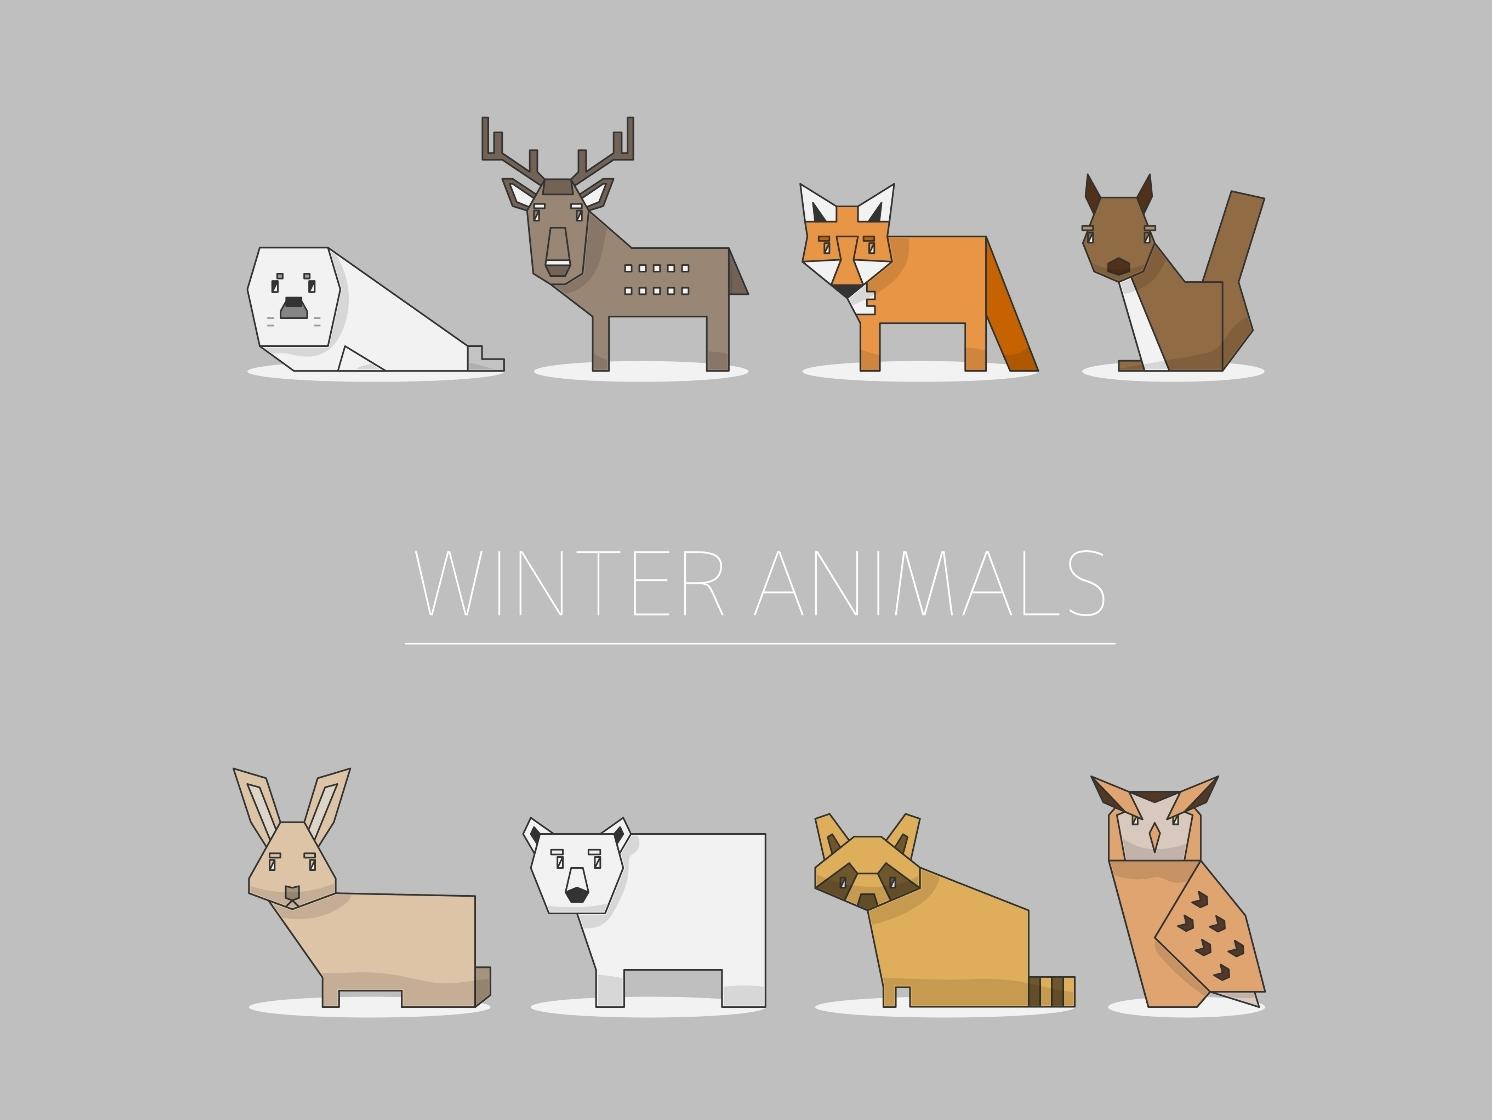 Winter Animals icons design illustration vector animals cute animals winter harp seal deer fox squirrel rabbit polarbear raccoon owl cute set simple children bear